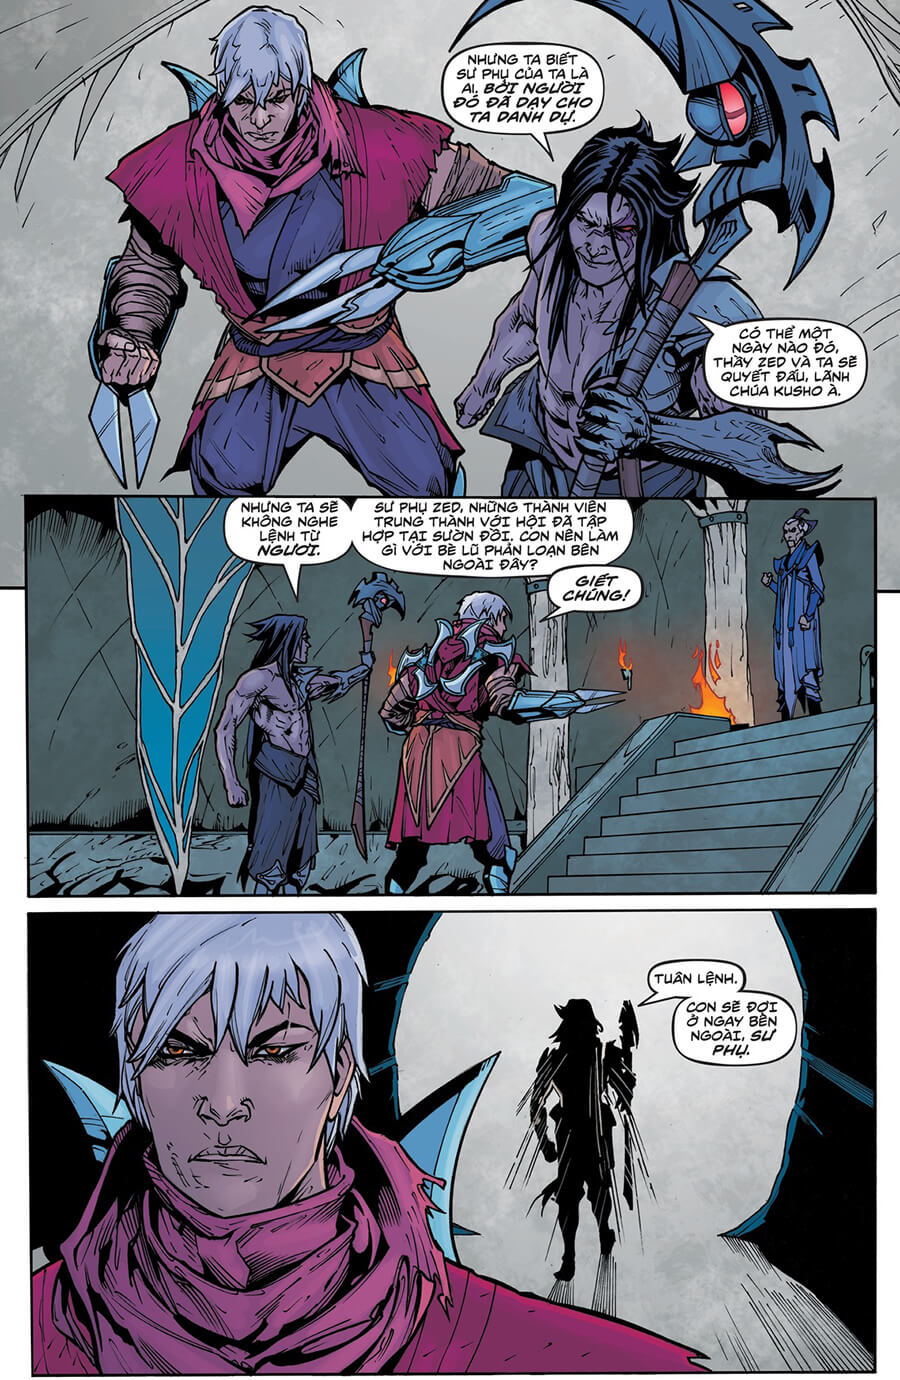 Truyện tranh Zed Kỳ 6 trang 17